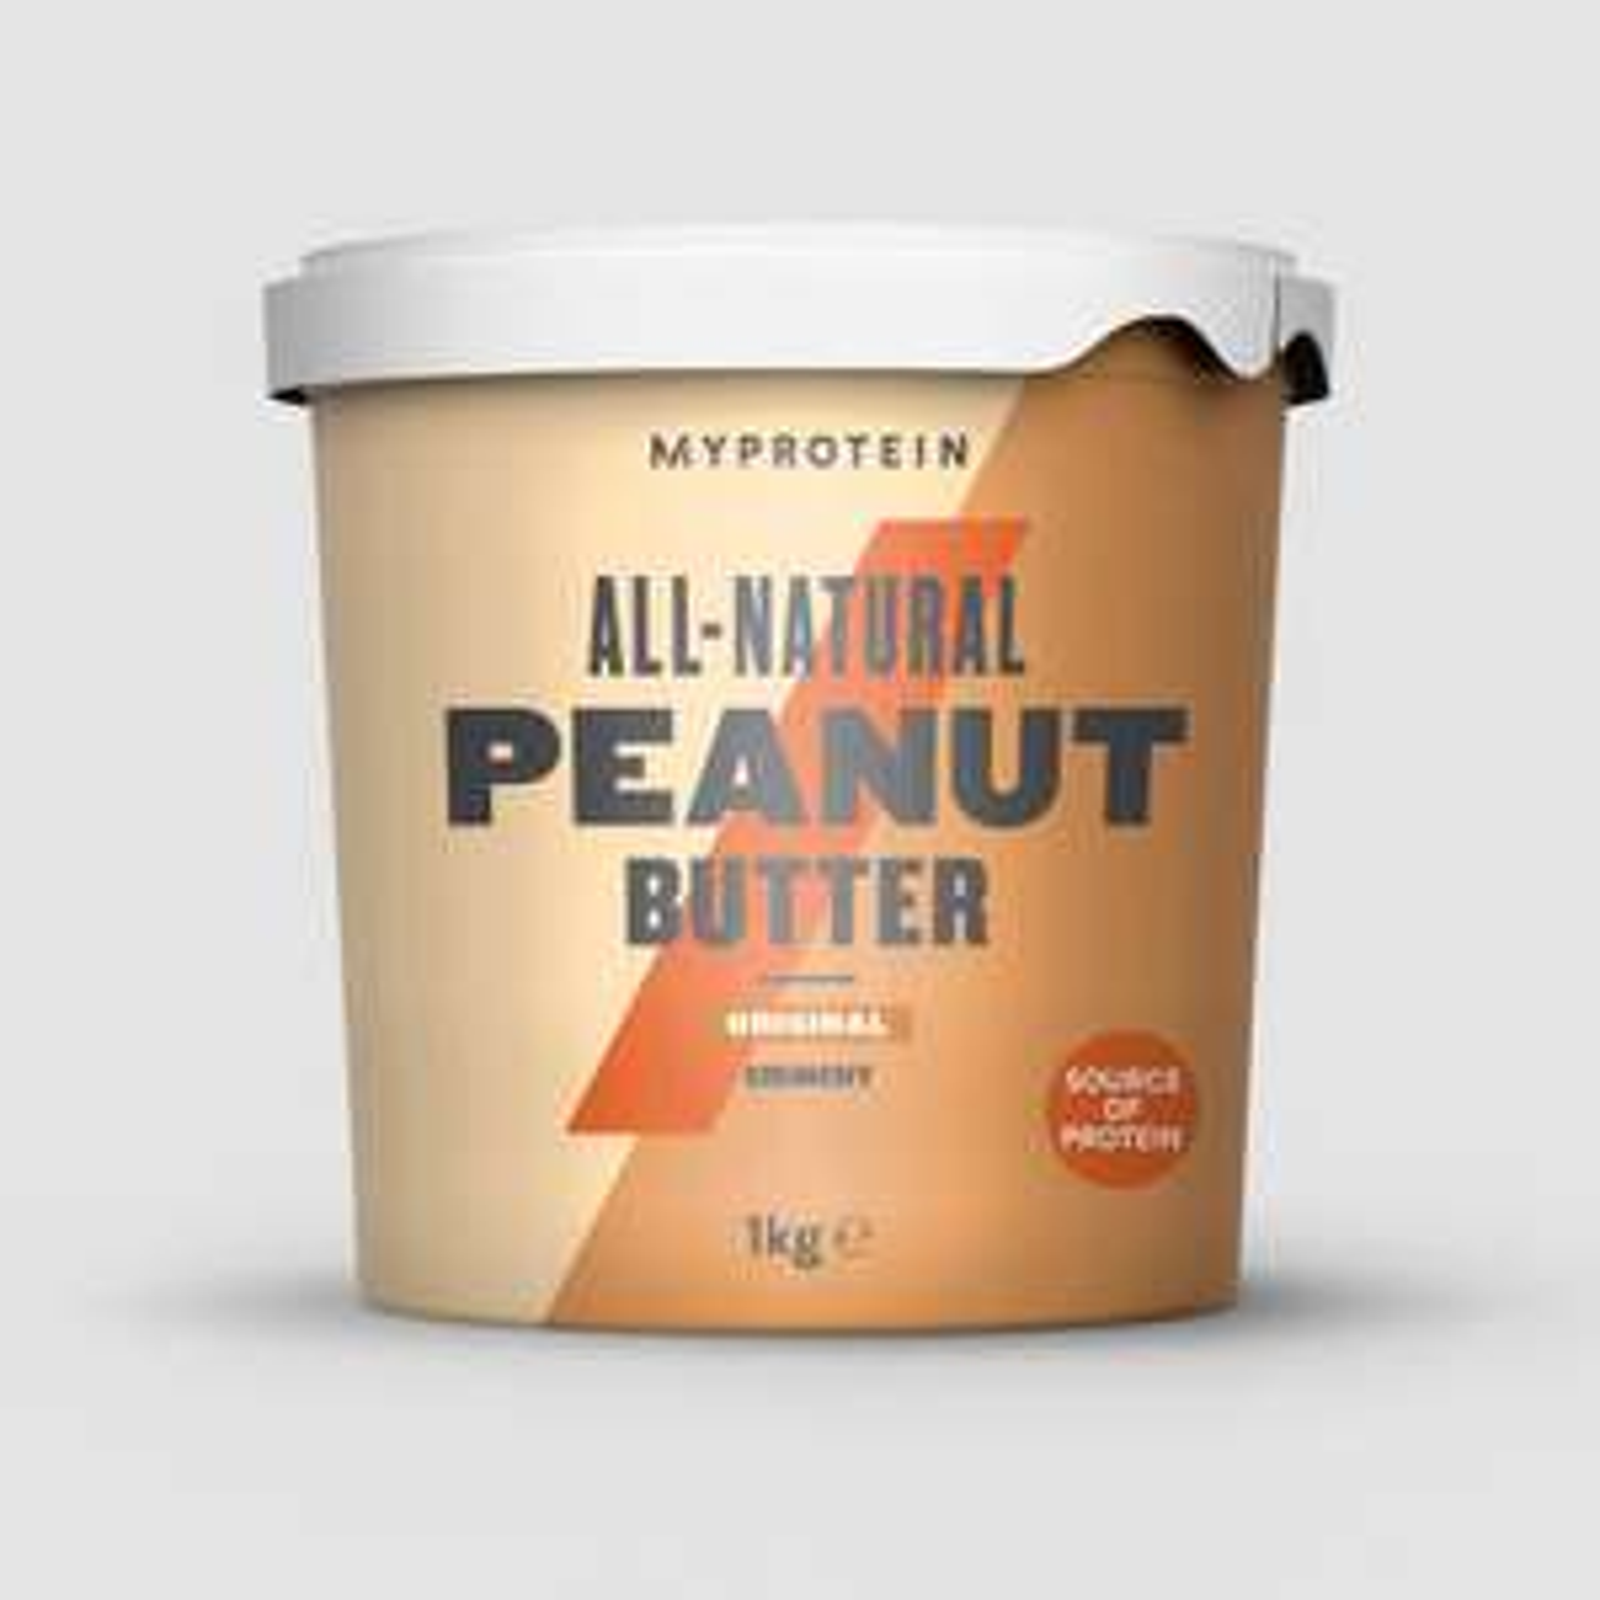 4kg All-Natural Peanut Butter (Crunchy or Smooth) + Vegan Carb Crusher Sample for £14.45 delivered @ Myprotein